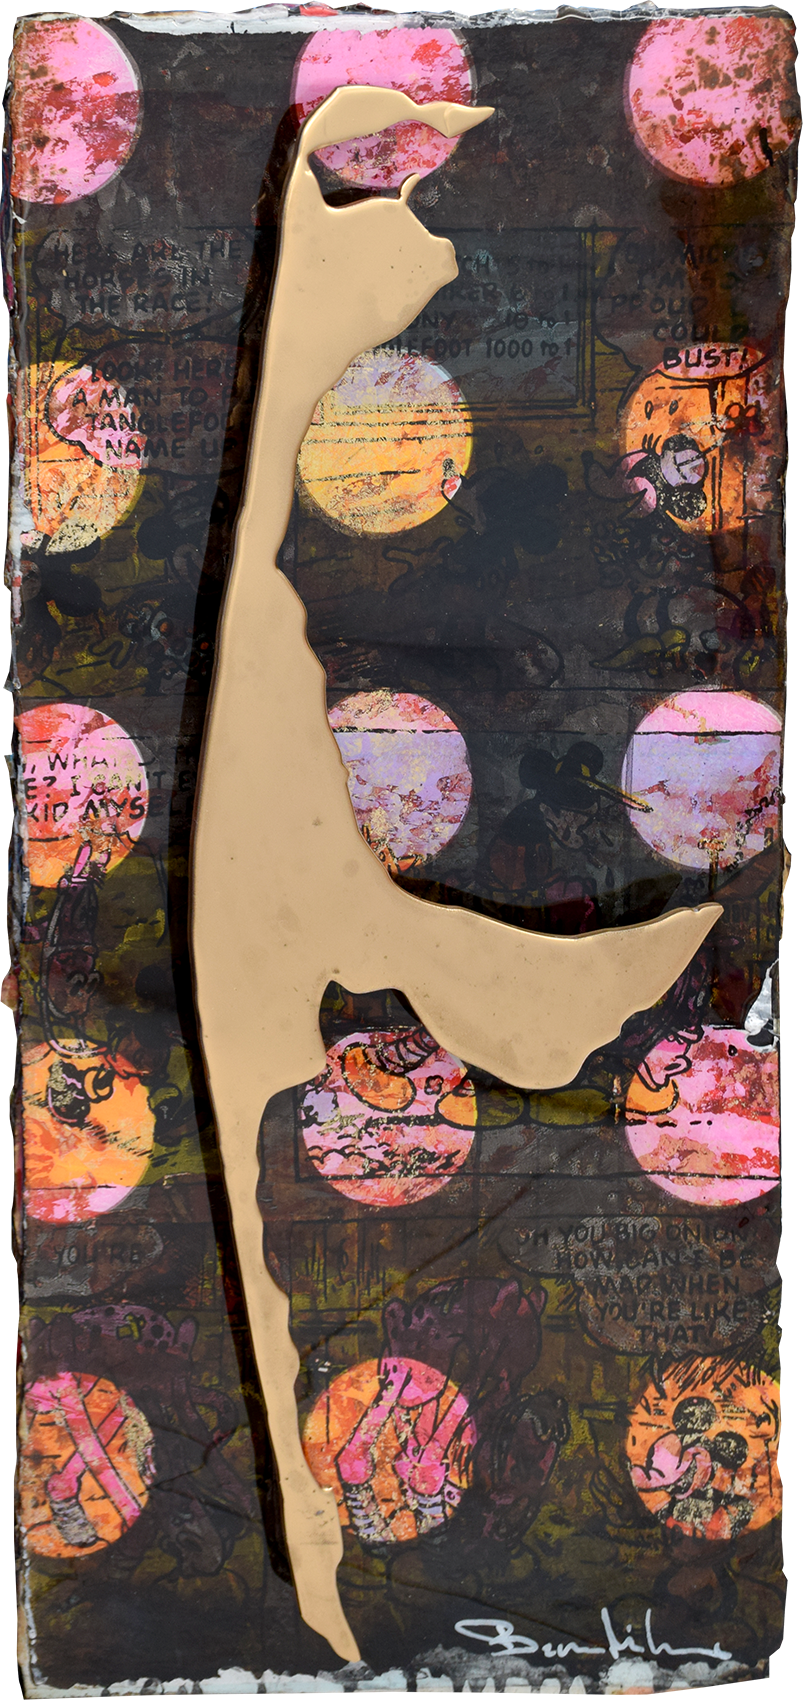 Bram Reijnders - Syltie , 8031-012-117